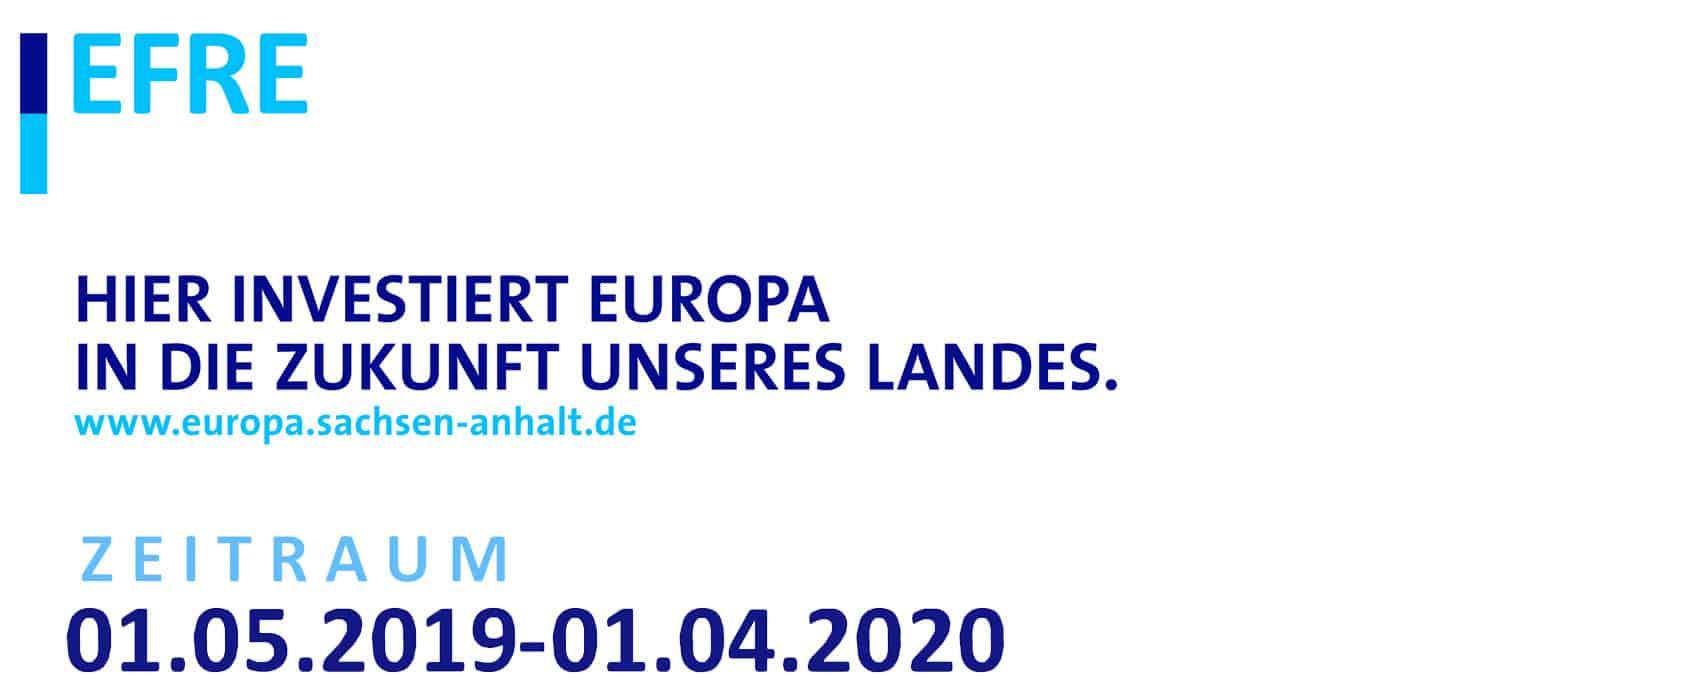 ESIF_hier.investiert.europa.in_.d.zukunft_2